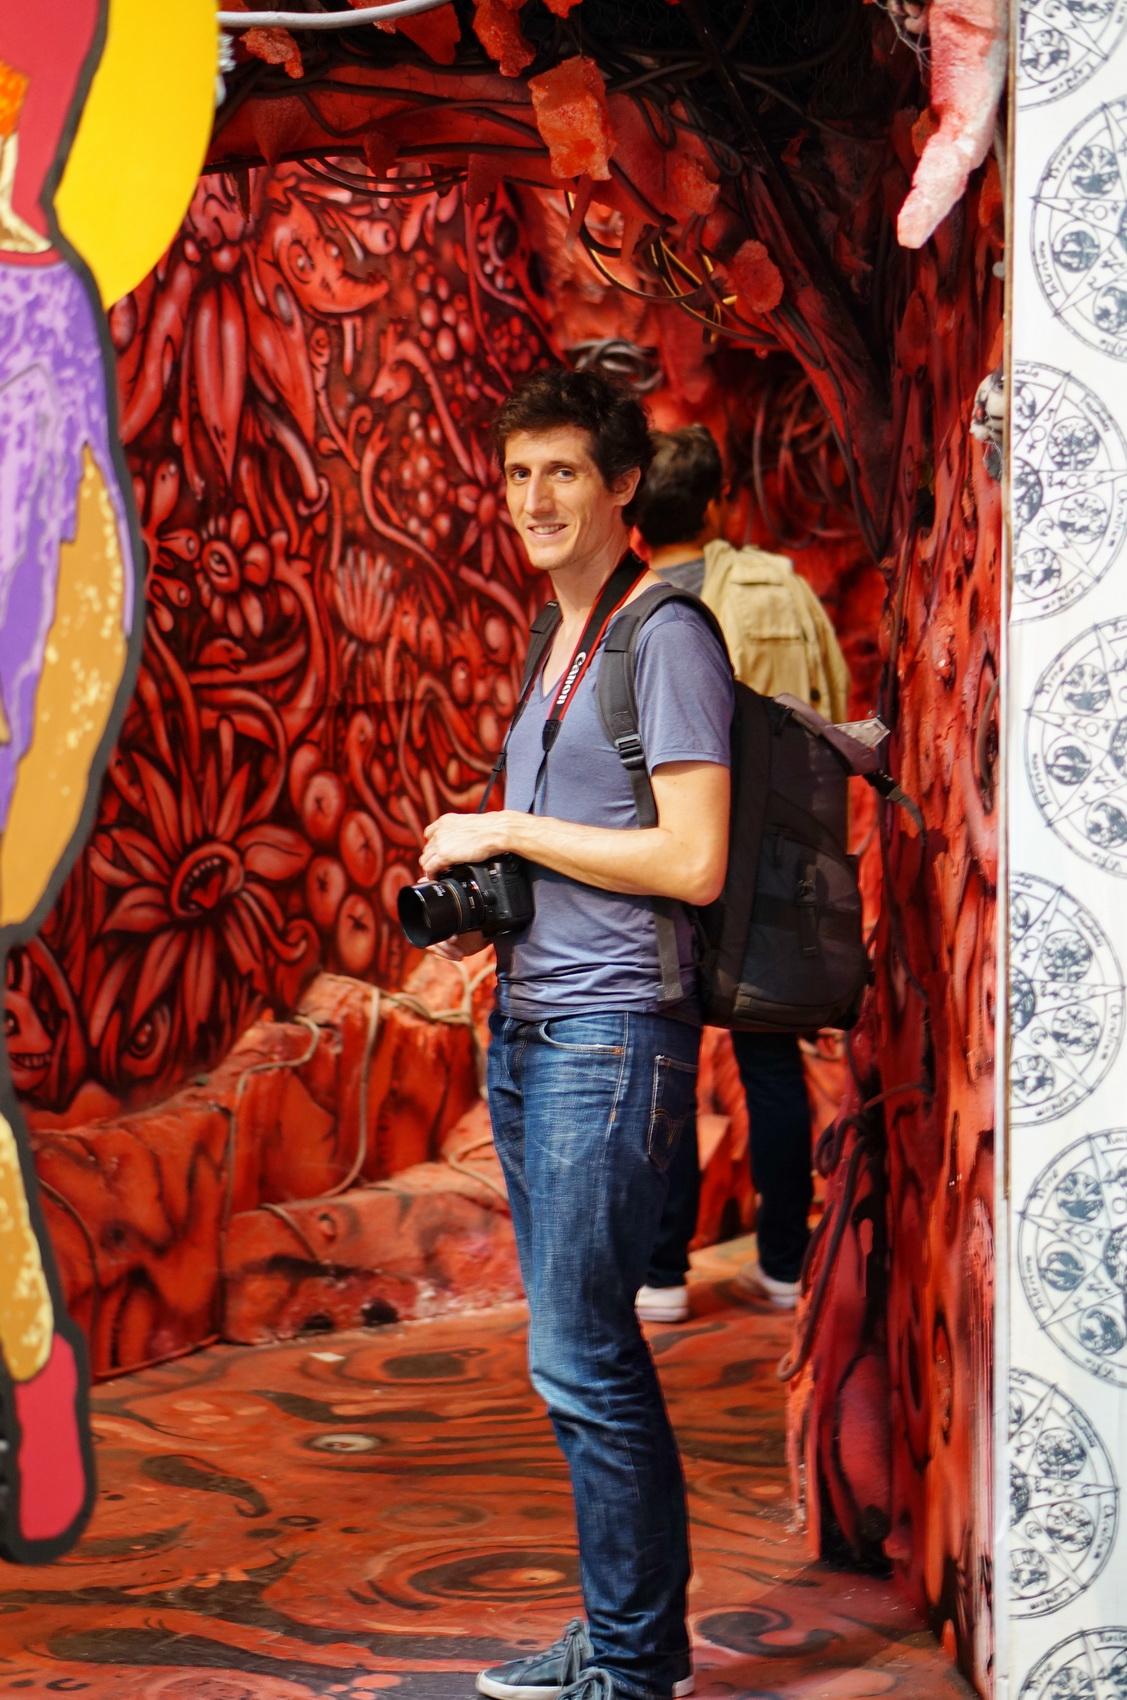 réserve malakoff, la réserve, la réserve malakoff, street art, street art paris, street art ile de france, urban art, wall art, art urbain, culture urbaine